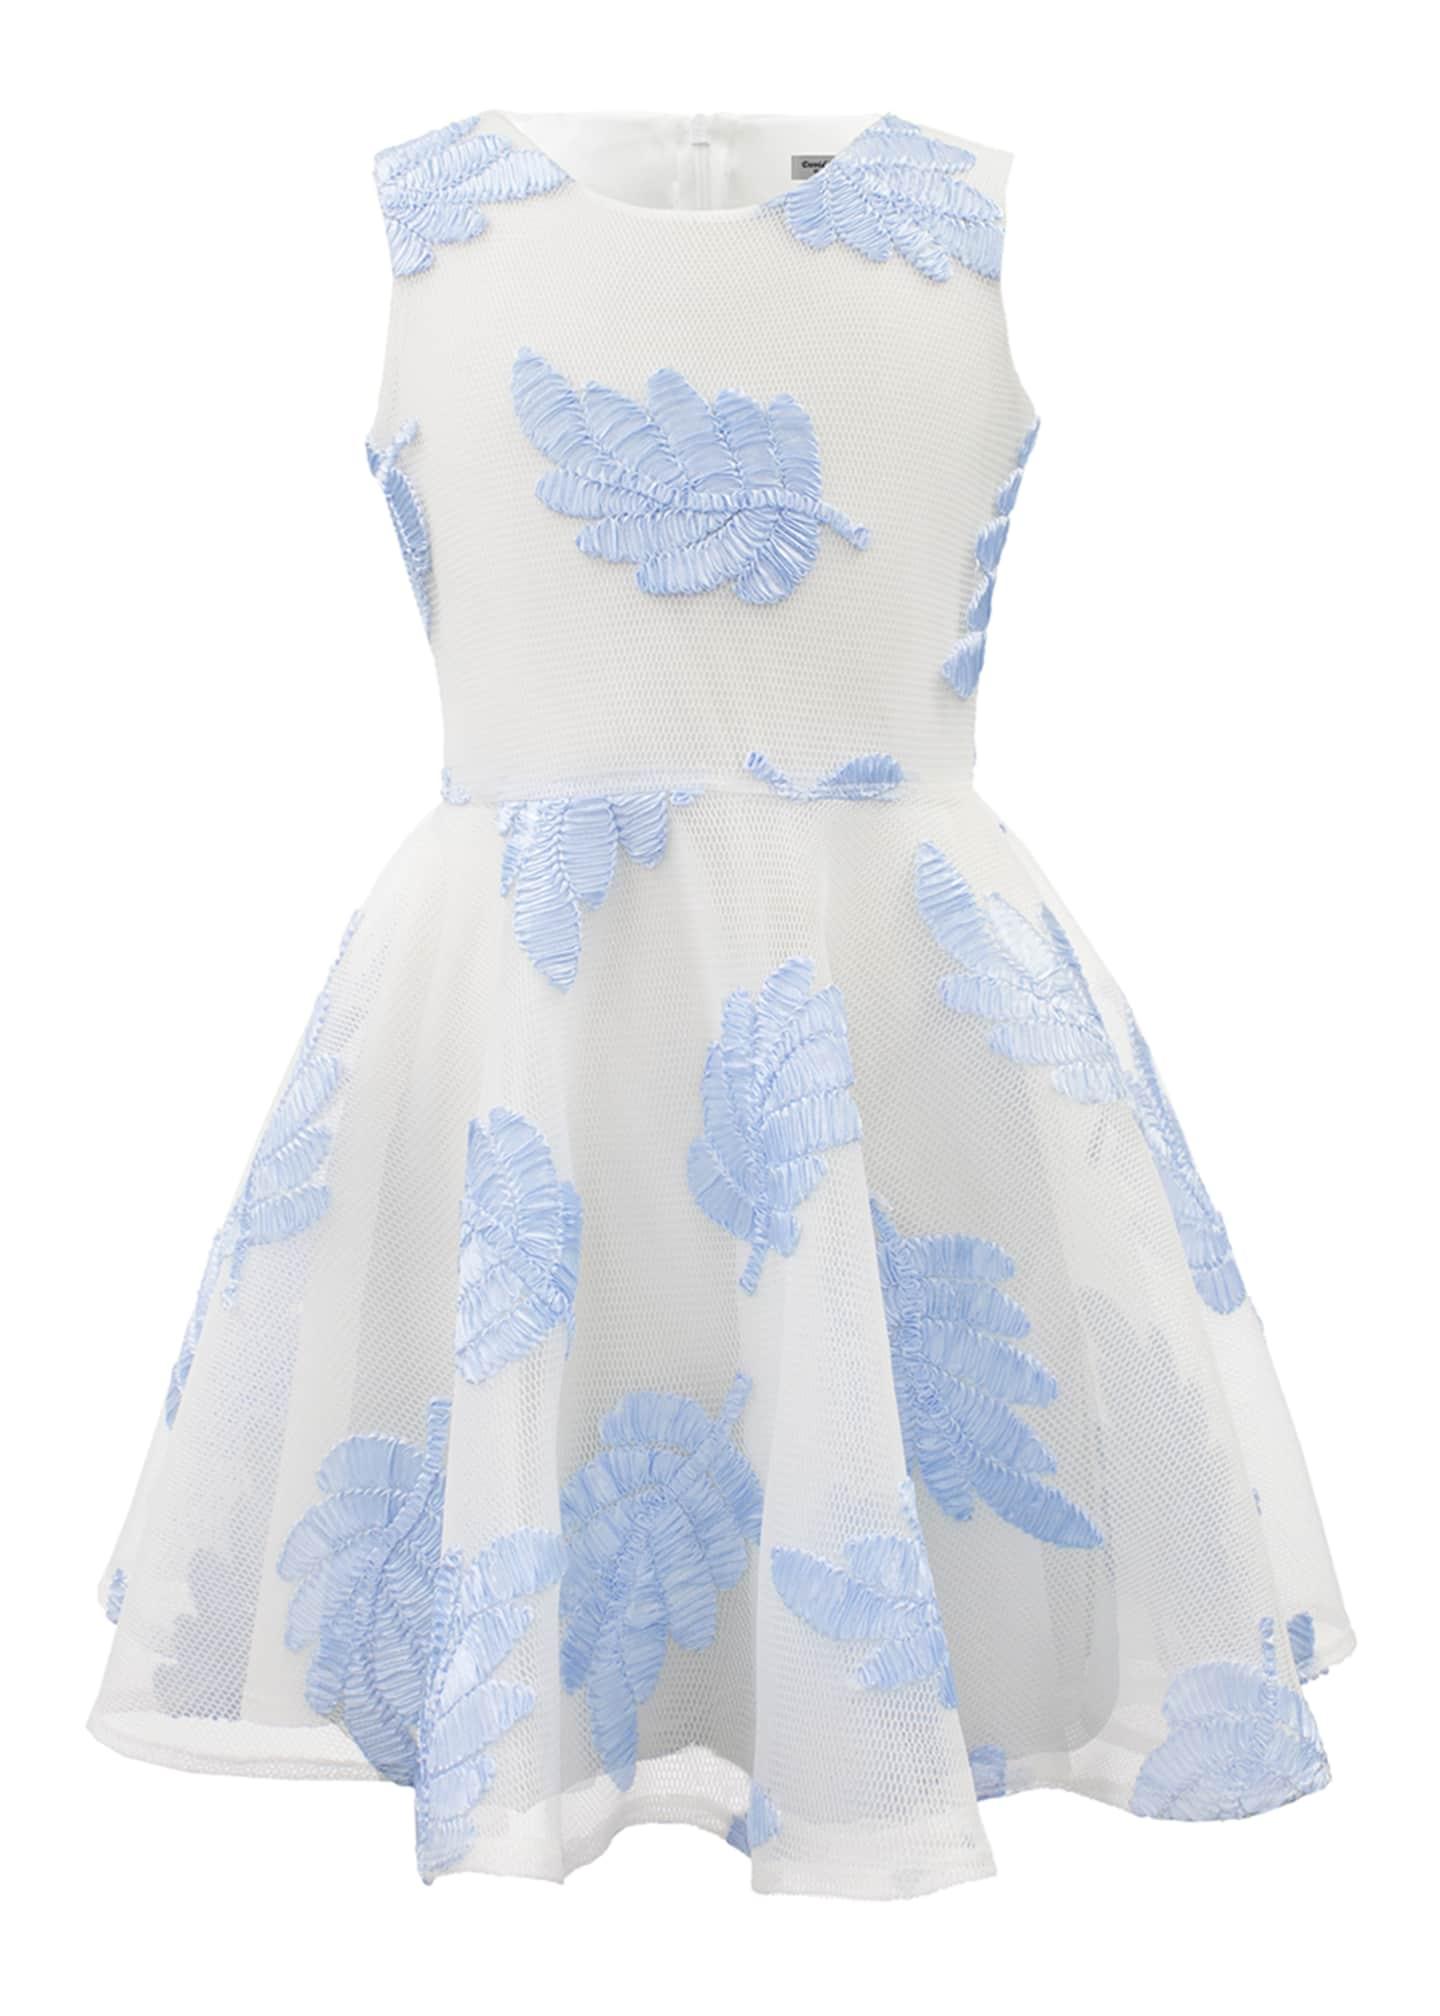 David Charles Sleeveless Leaf Applique Mesh-Overlay Dress, Size